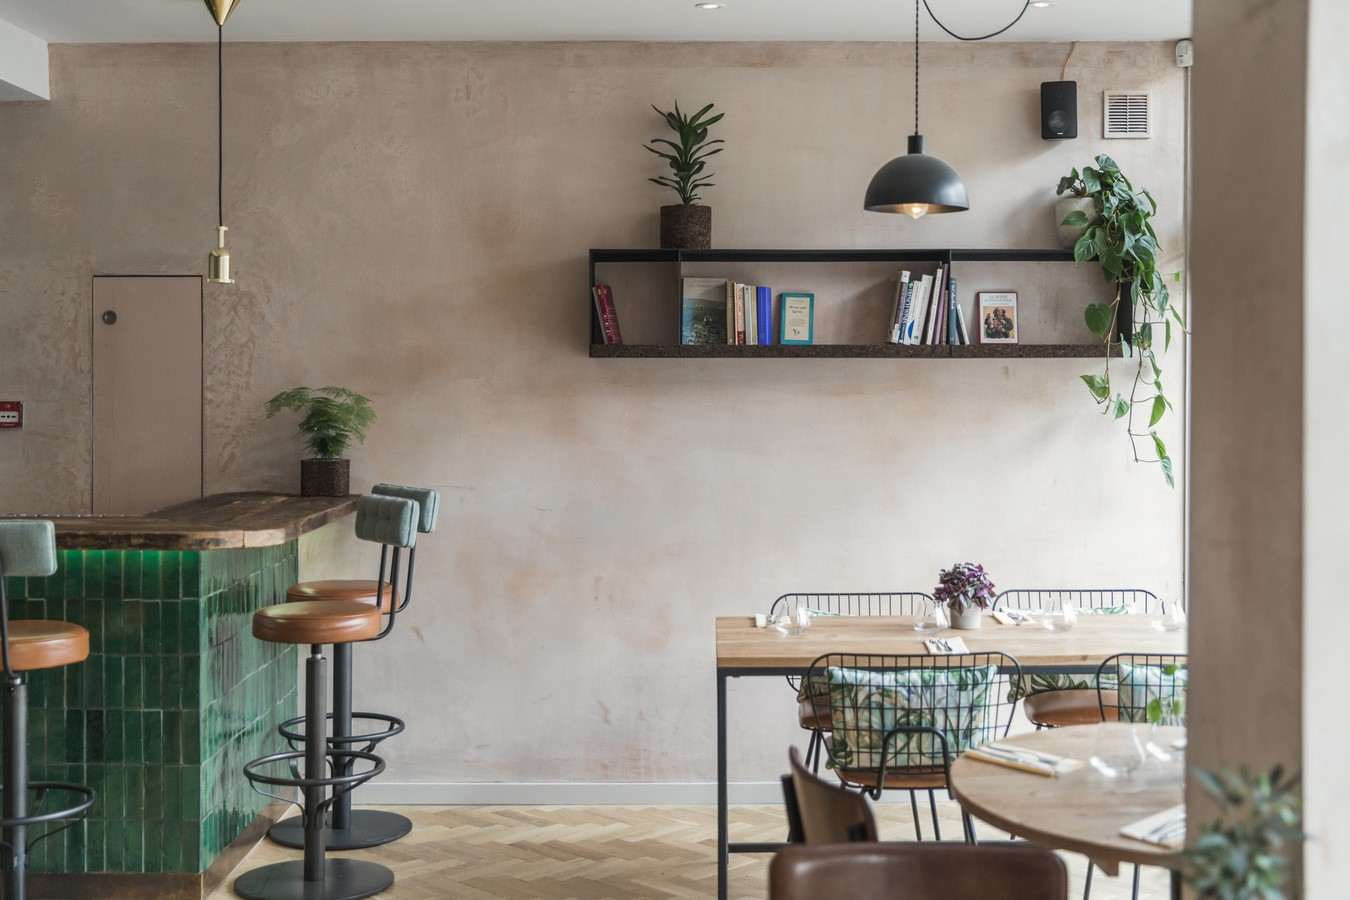 Humble Grape Wine Bar + Shop + Kitchen by Trellik Design Studio - Sheet2